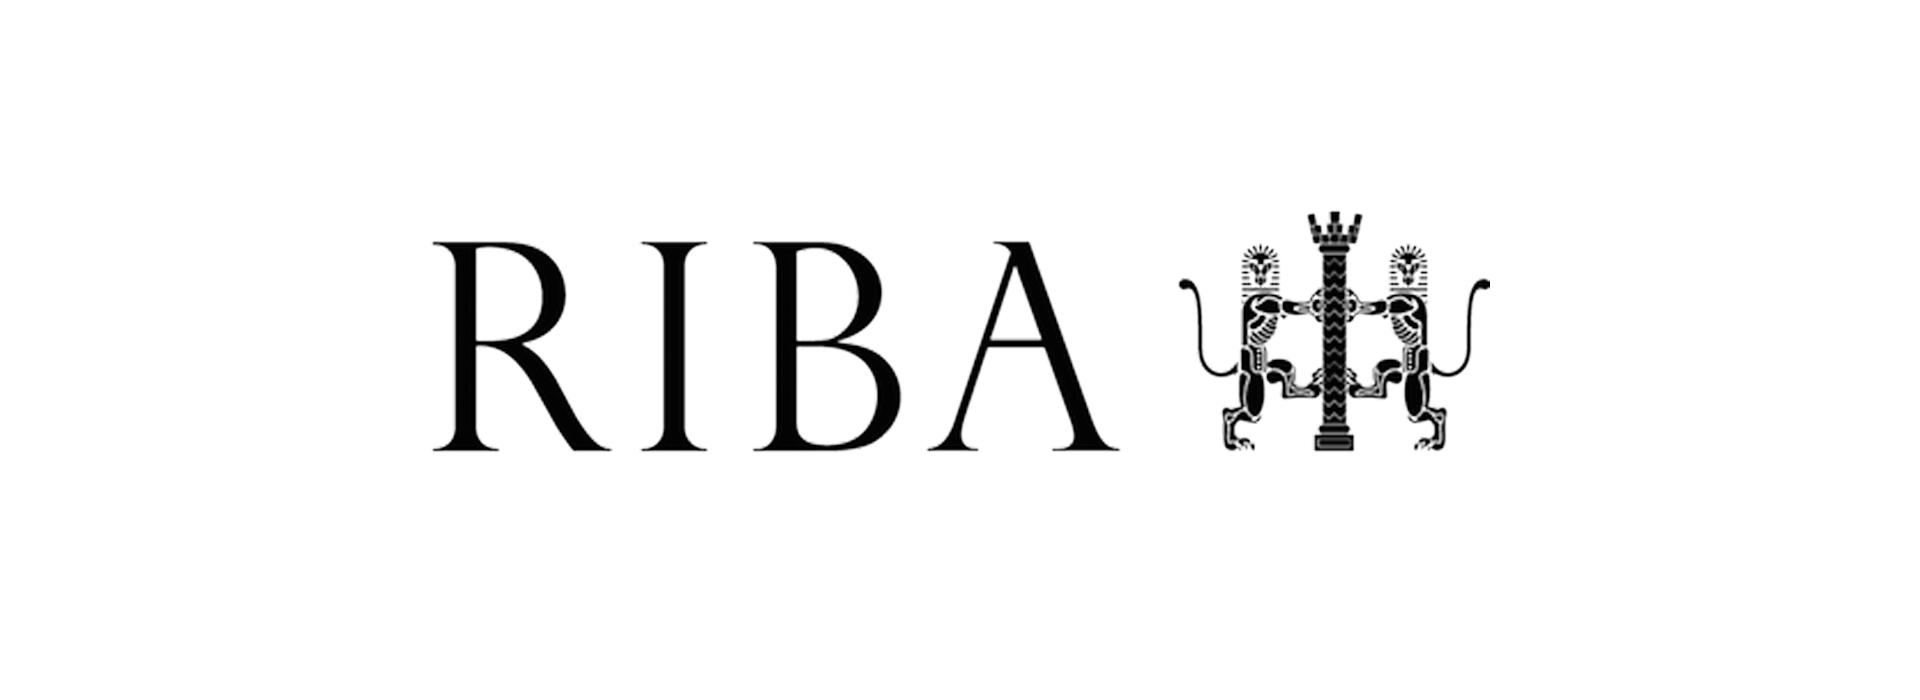 Royal Institute of British Architects - RIBA